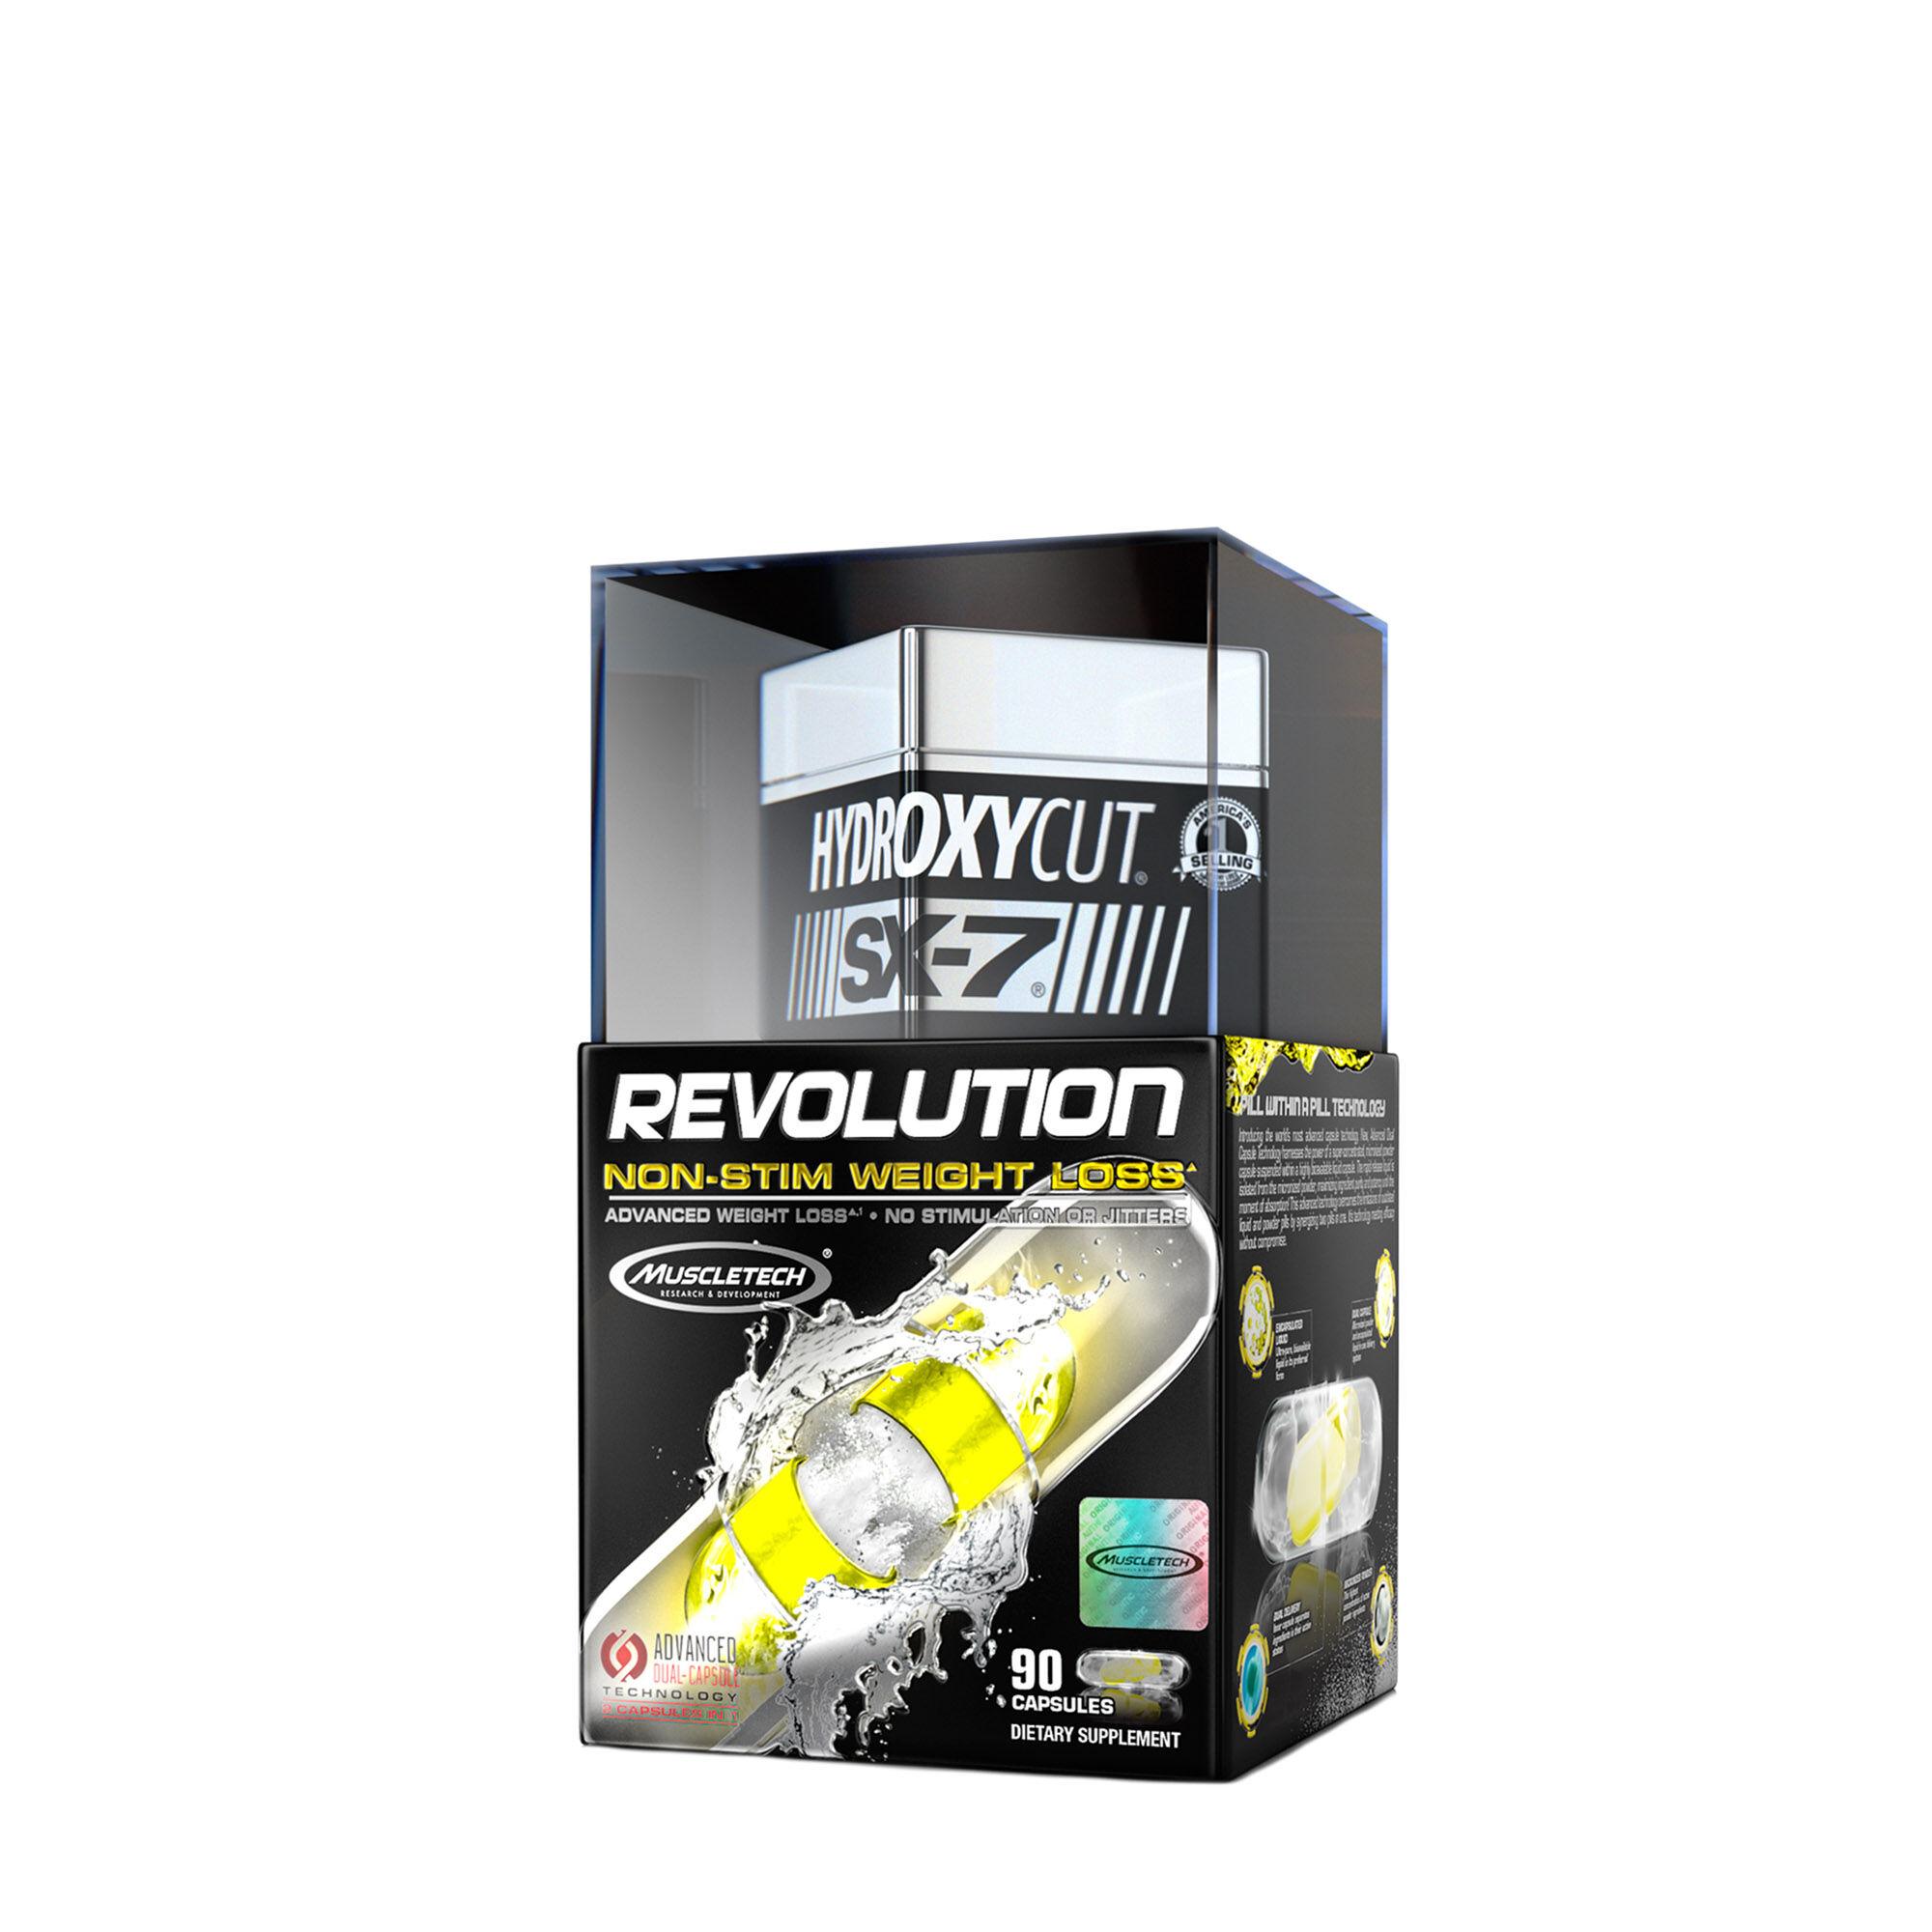 Muscletech Hydroxycut Sx 7 Revolution Non Stim